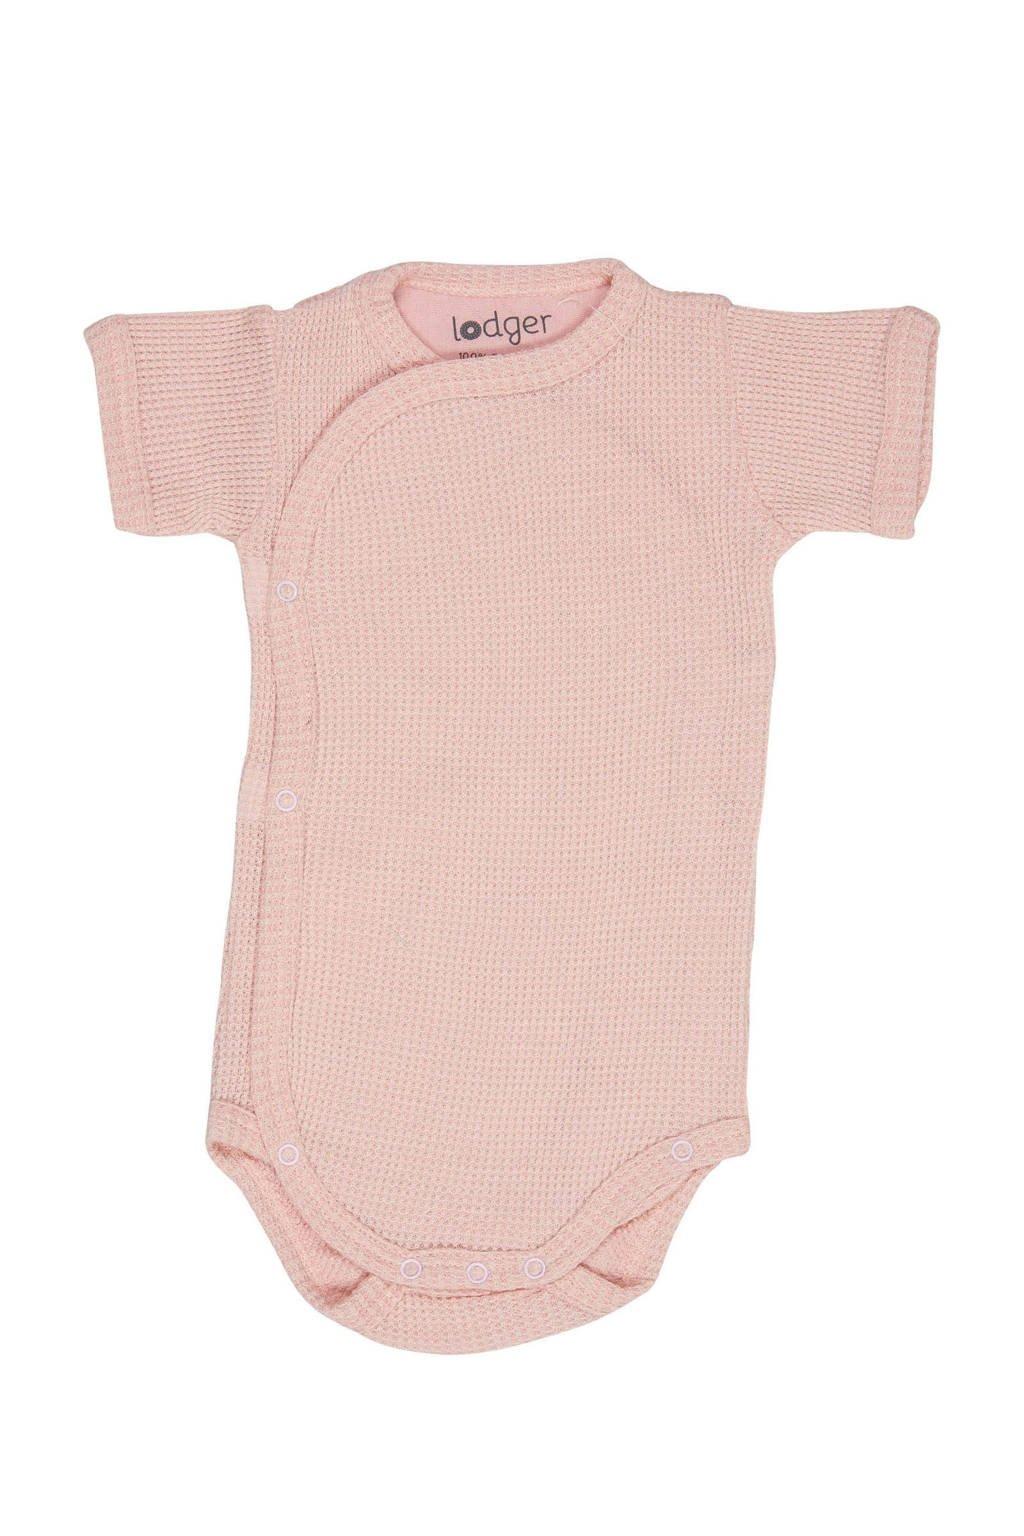 Lodger newborn baby romper Ciumbelle, Lichtroze